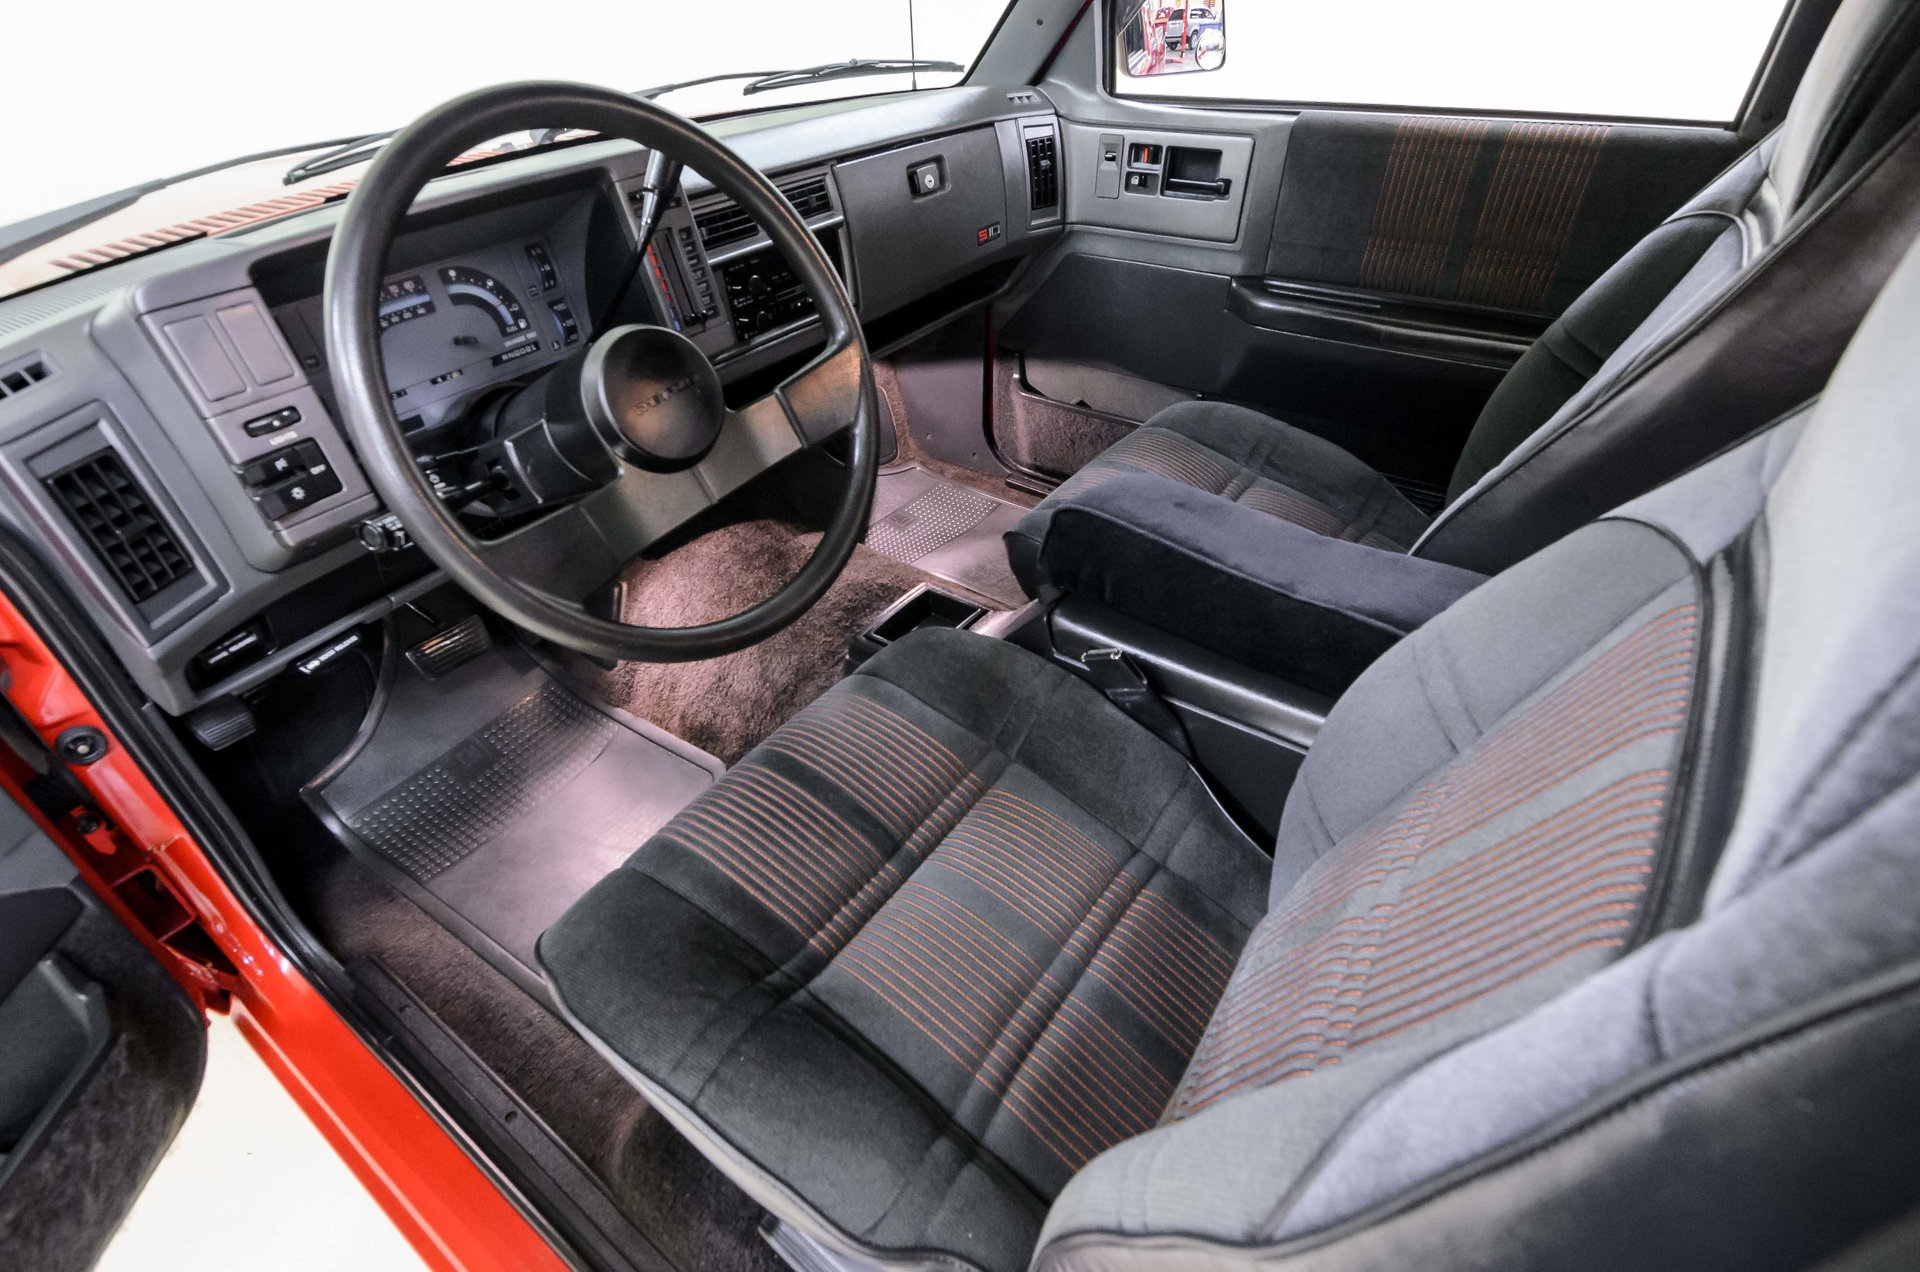 1991 Chevrolet S10 | Auto Barn Classic Cars